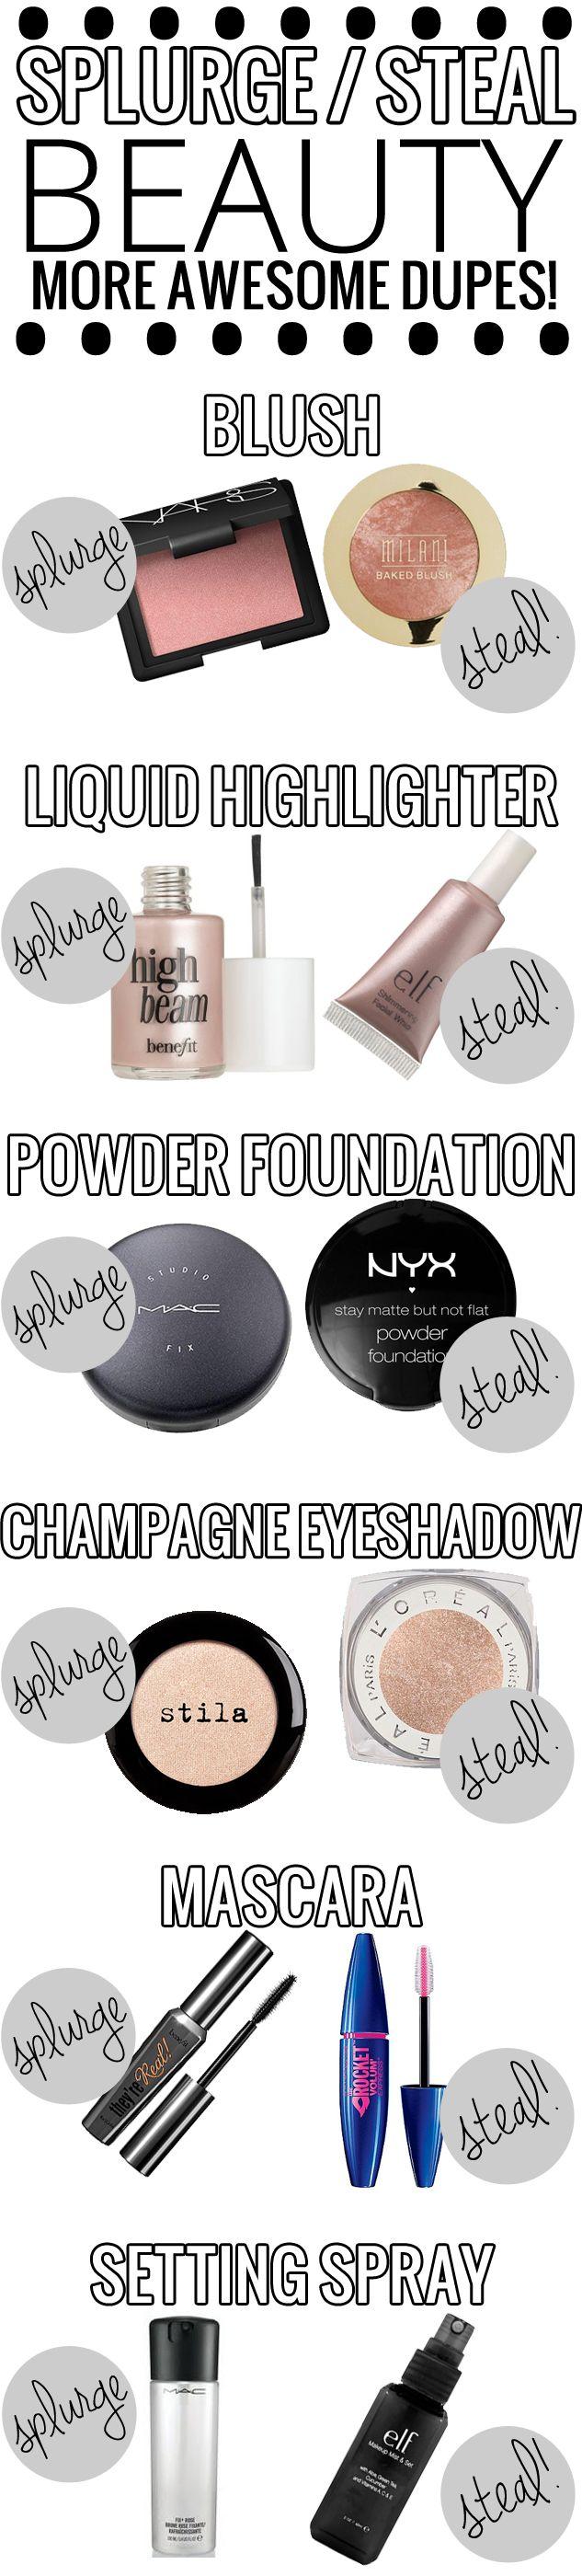 makeup dupes, splurge vs steal beauty